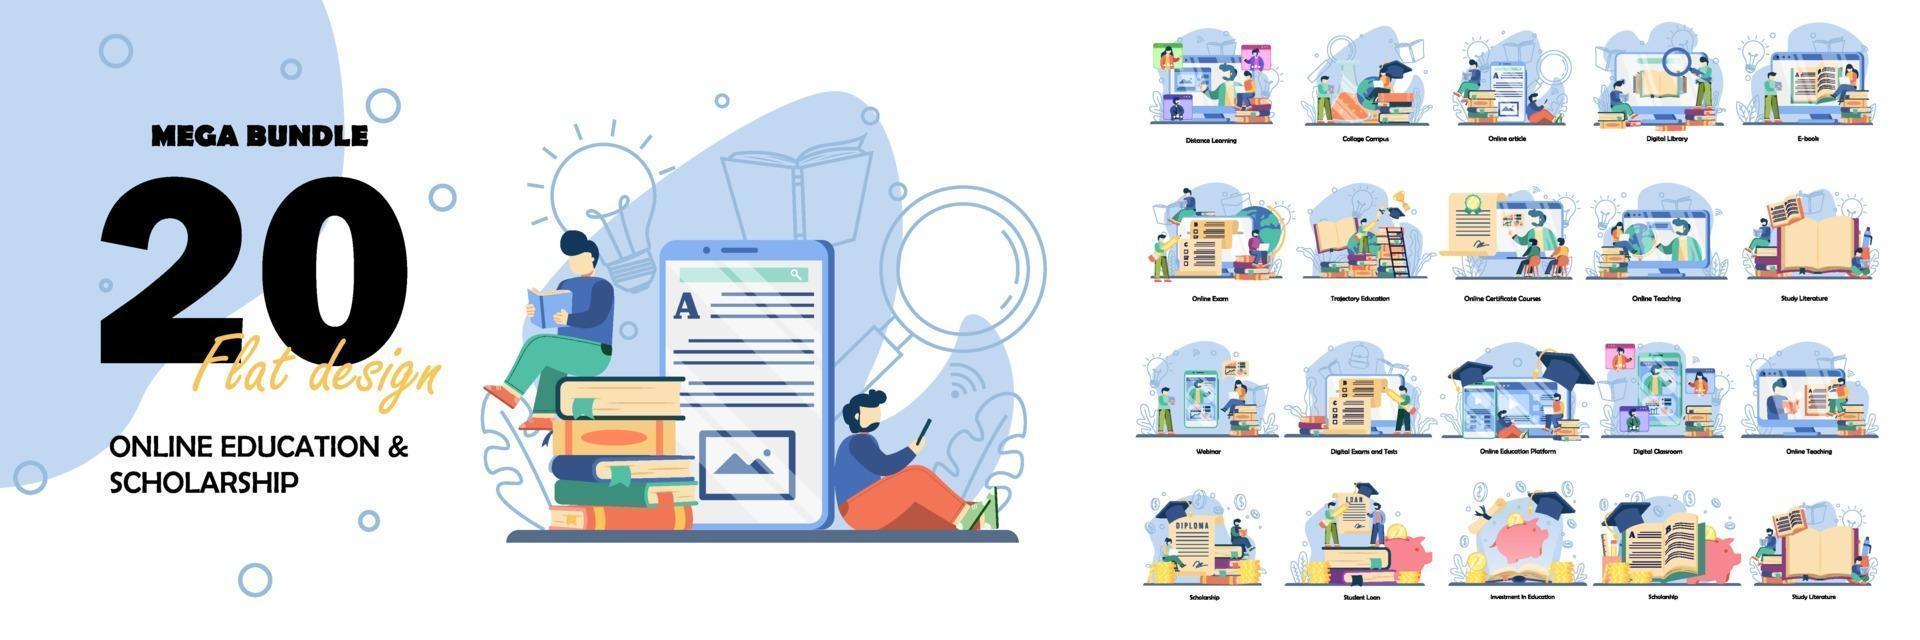 Big Set Education vector illustration. Online education, scholarship, back to school, Online Book, Webinar, Online Class, Achievement trophy.flat design style vector graphic illustration set